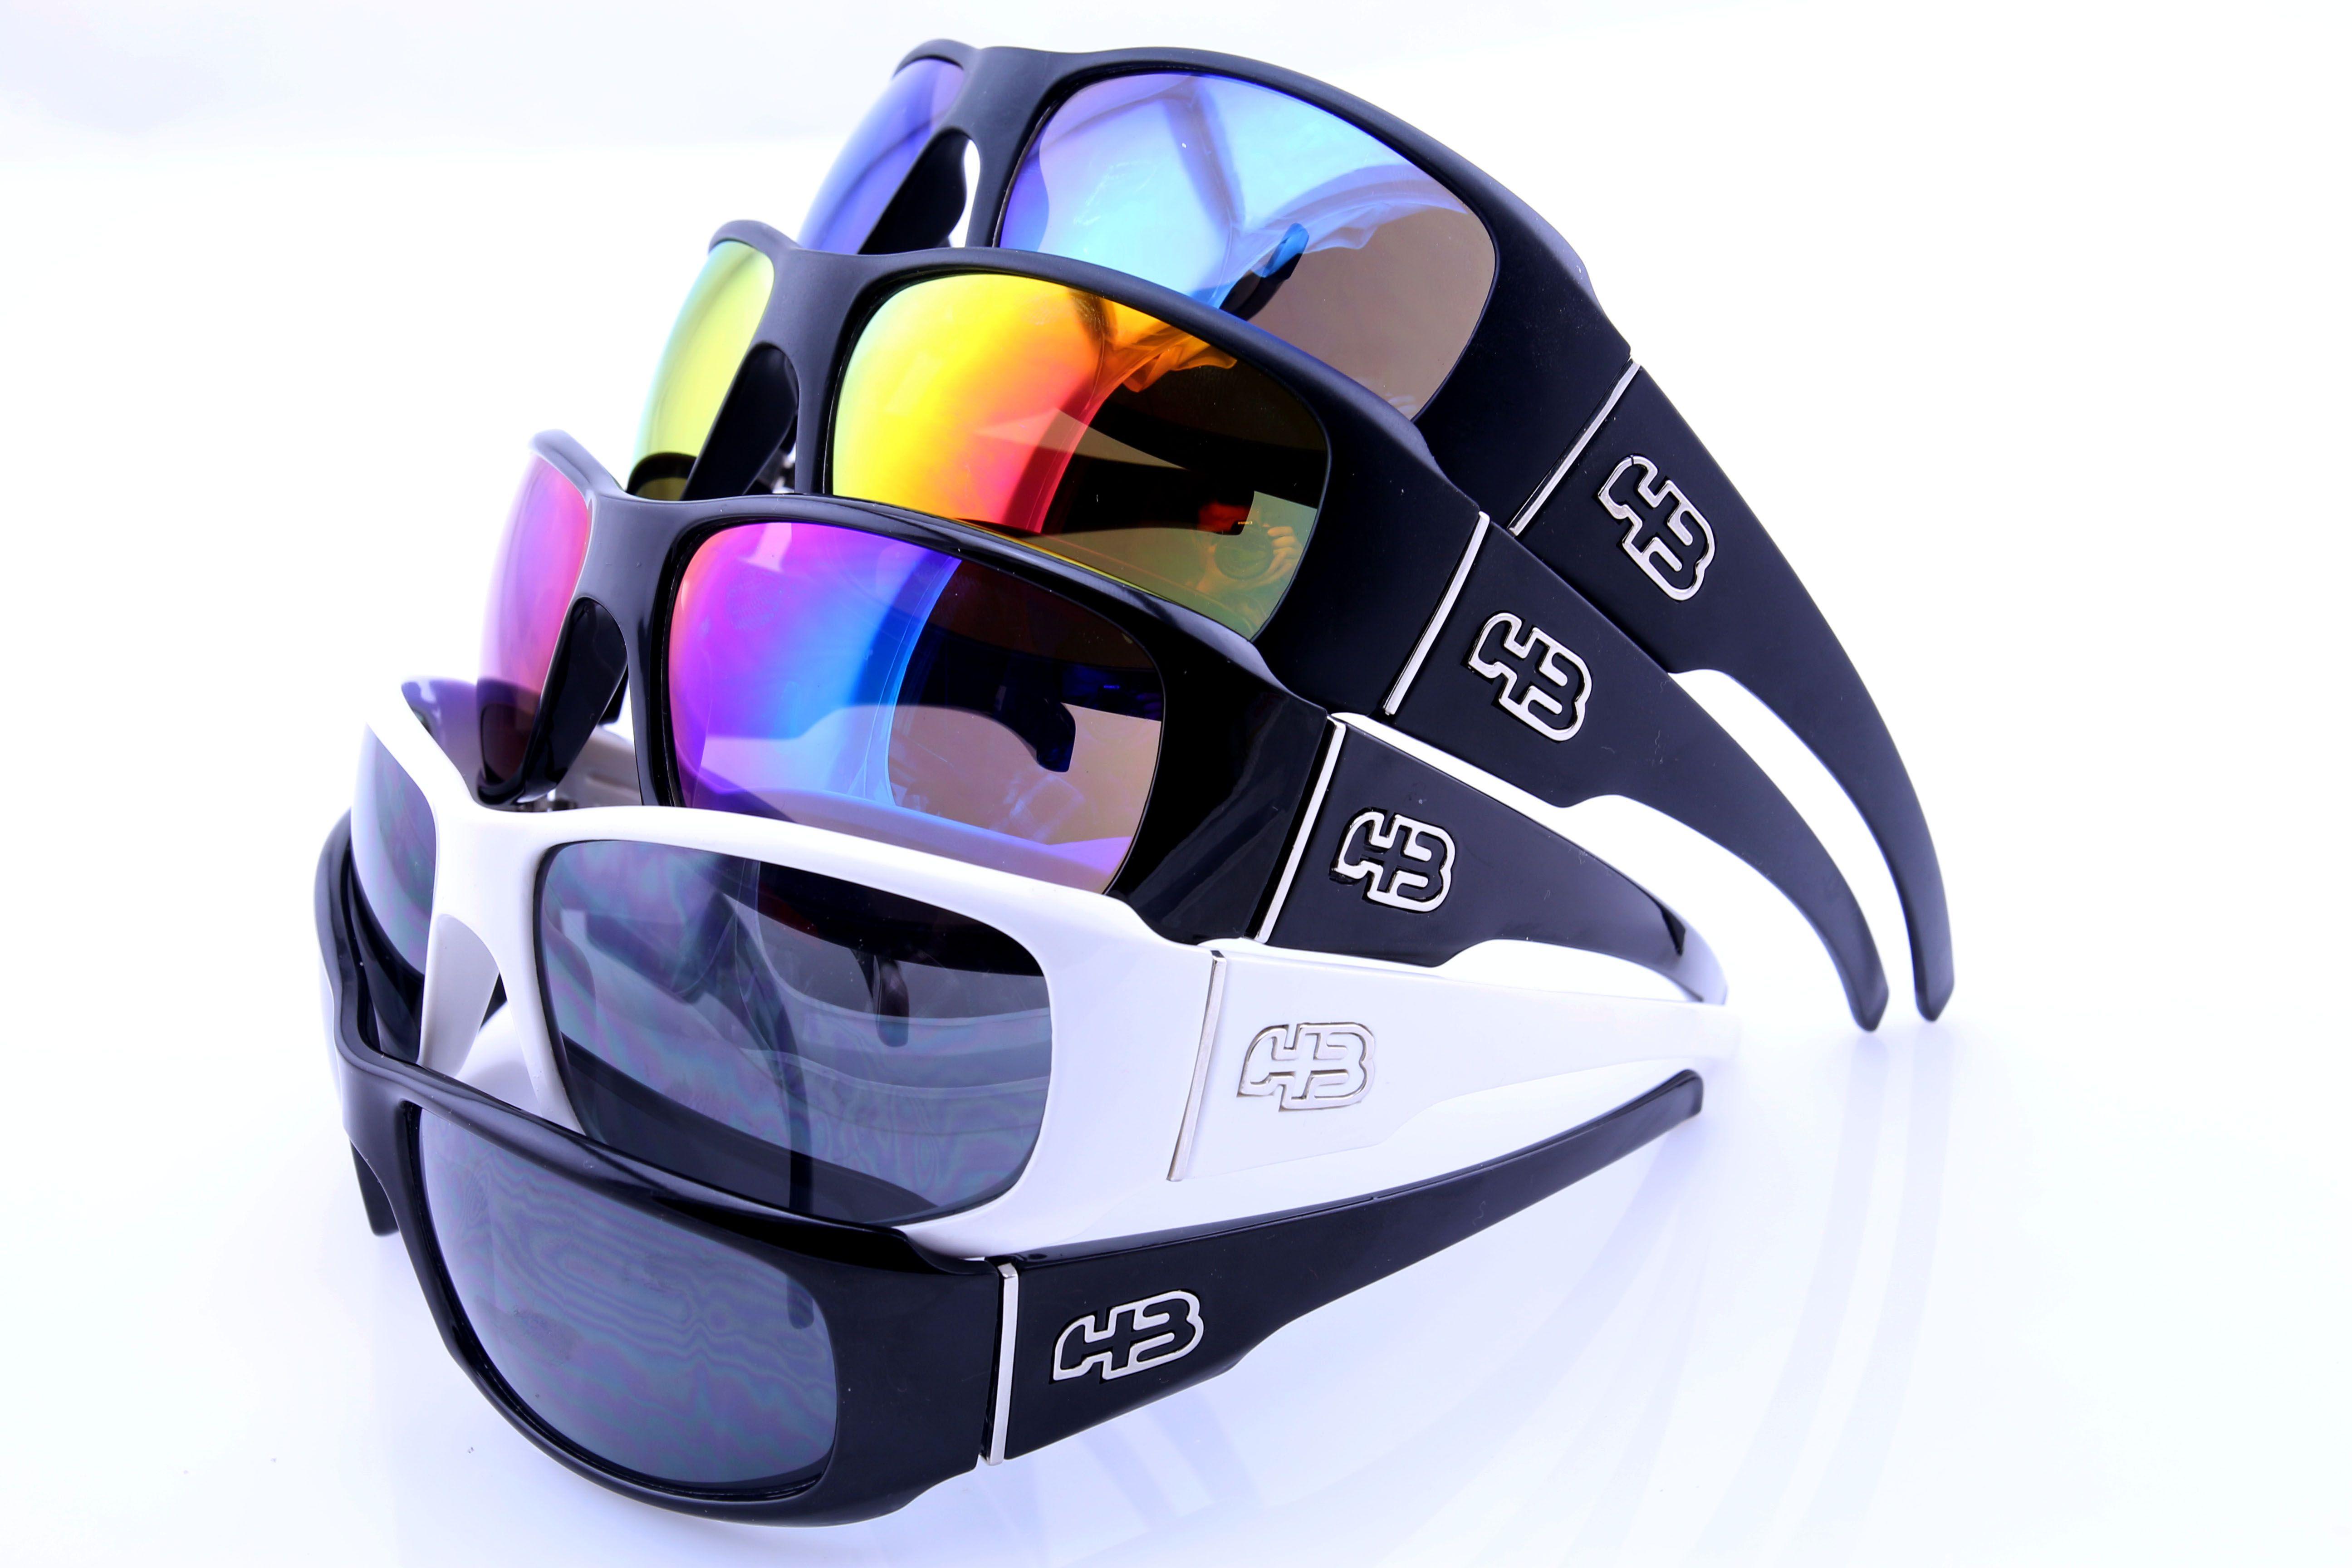 652d863dd42a9 2016 News Style Hb Hot Buttered G Tronic Brand Designer Oculos De Sol Mens  Outdoor Cycling Sports Gafas Evoke Sunglasses Discount Sunglasses Sports ...